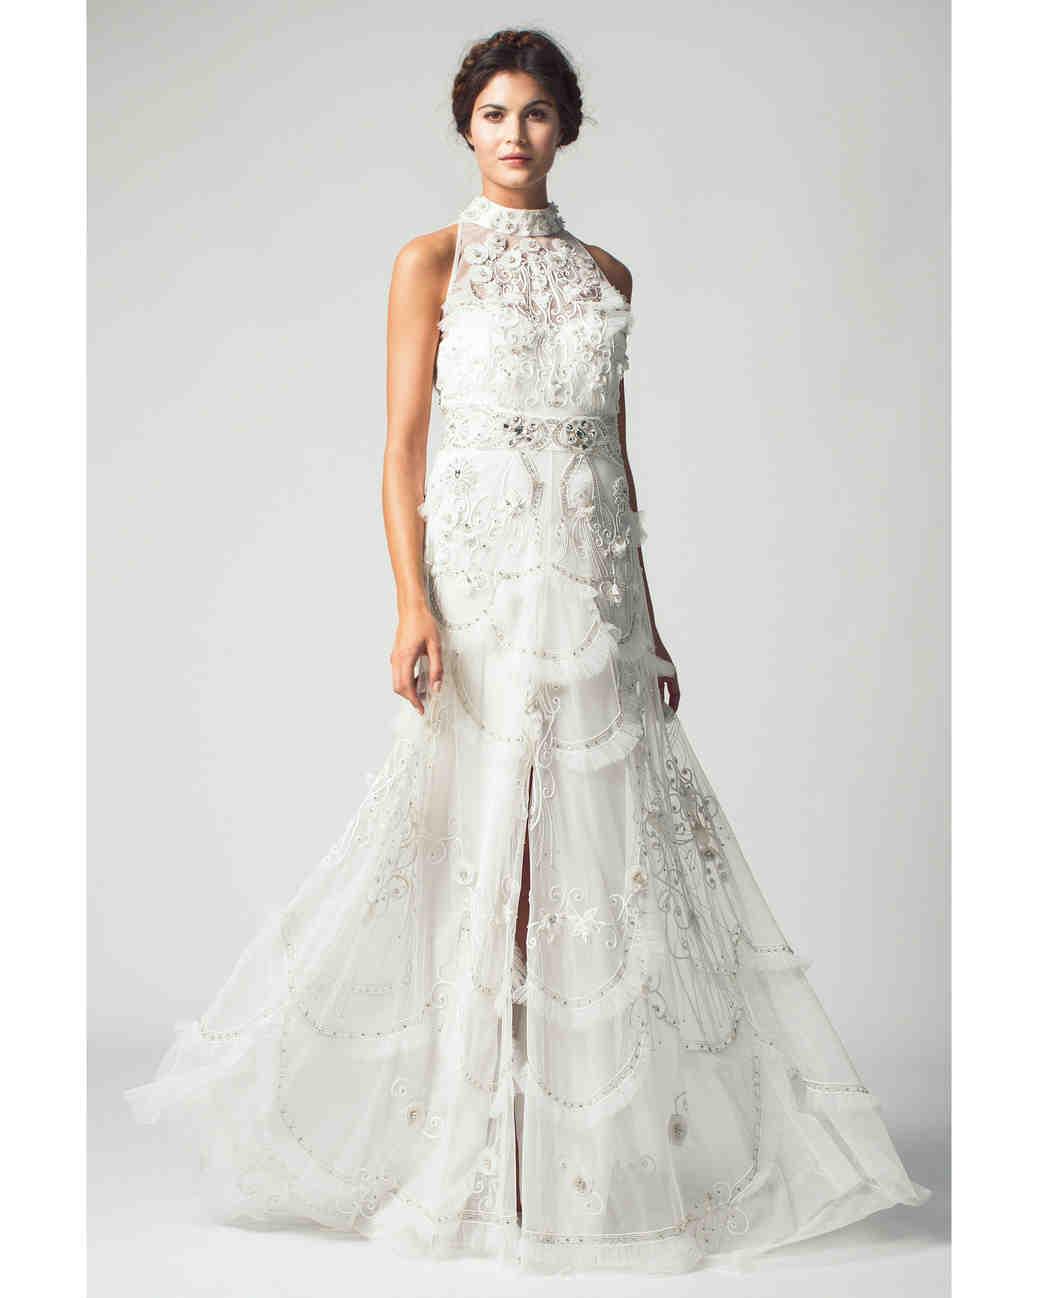 50-states-wedding-dresses-tennessee-temperley-s112015-0615.jpg